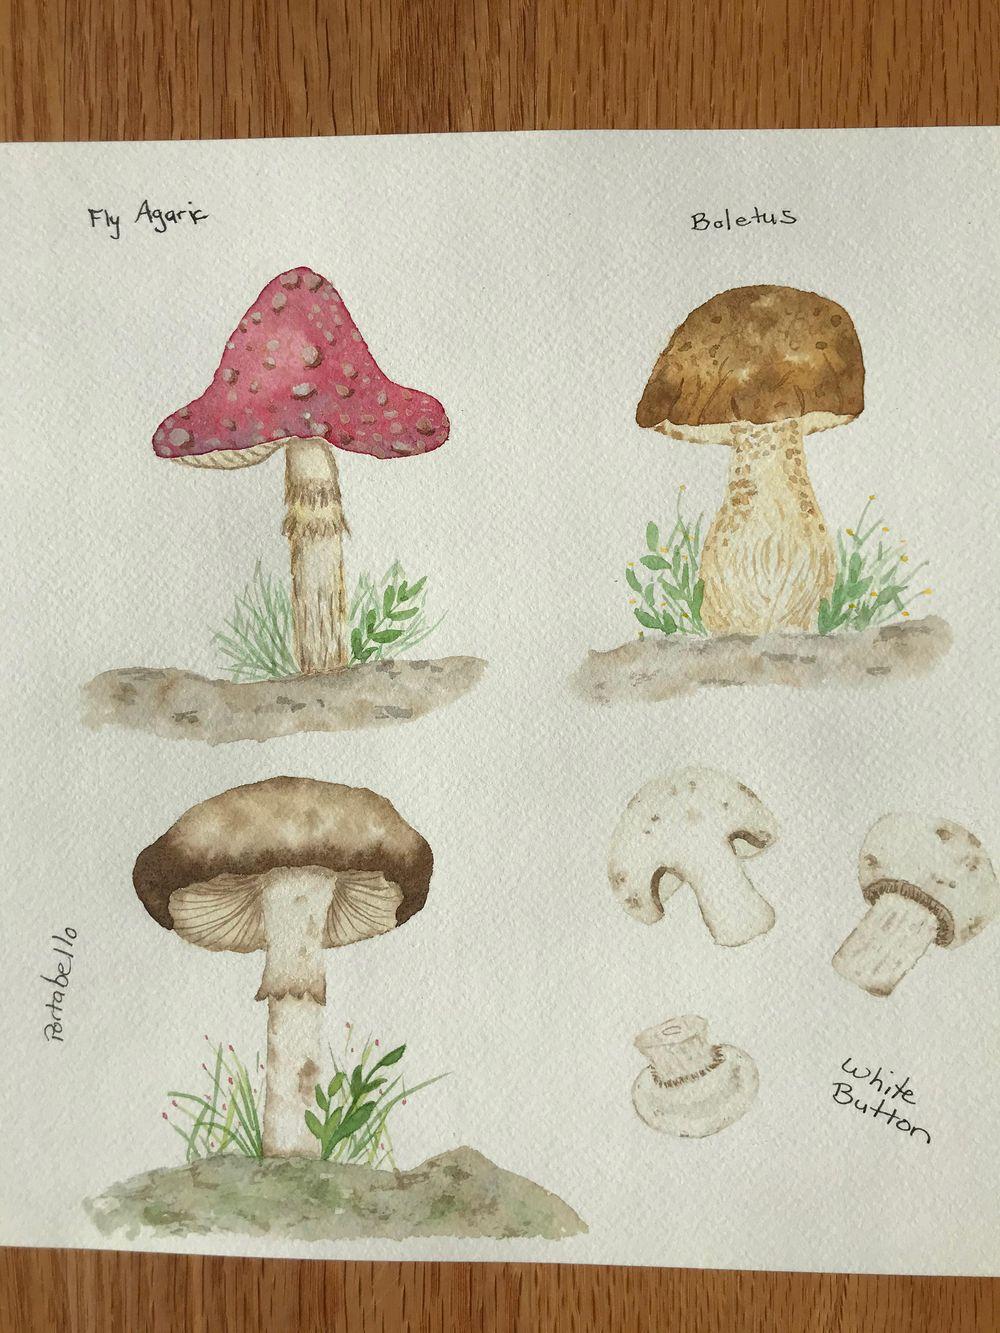 Mushrooms - image 4 - student project